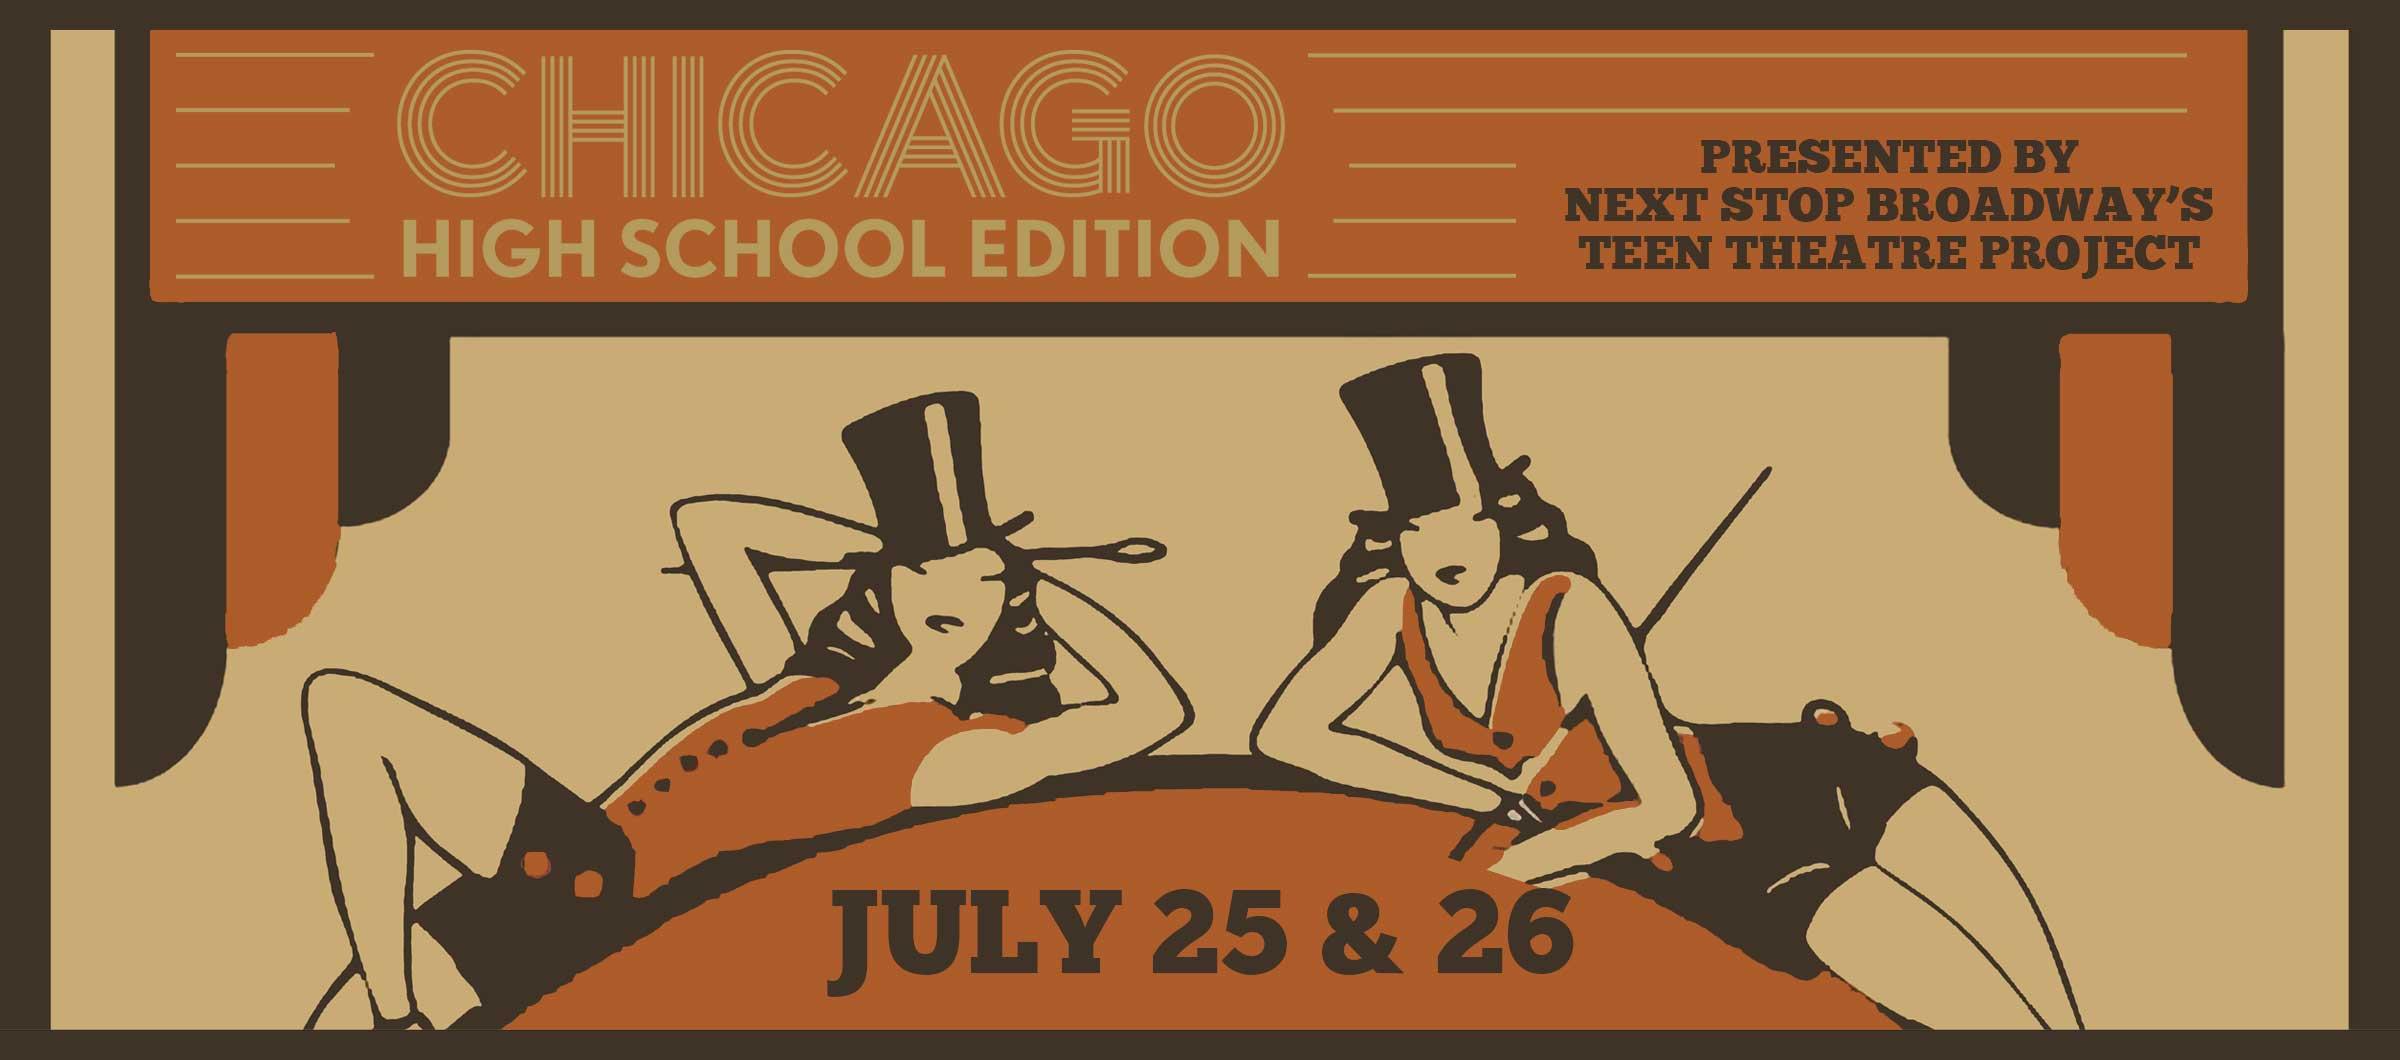 Chicago: High School Edition